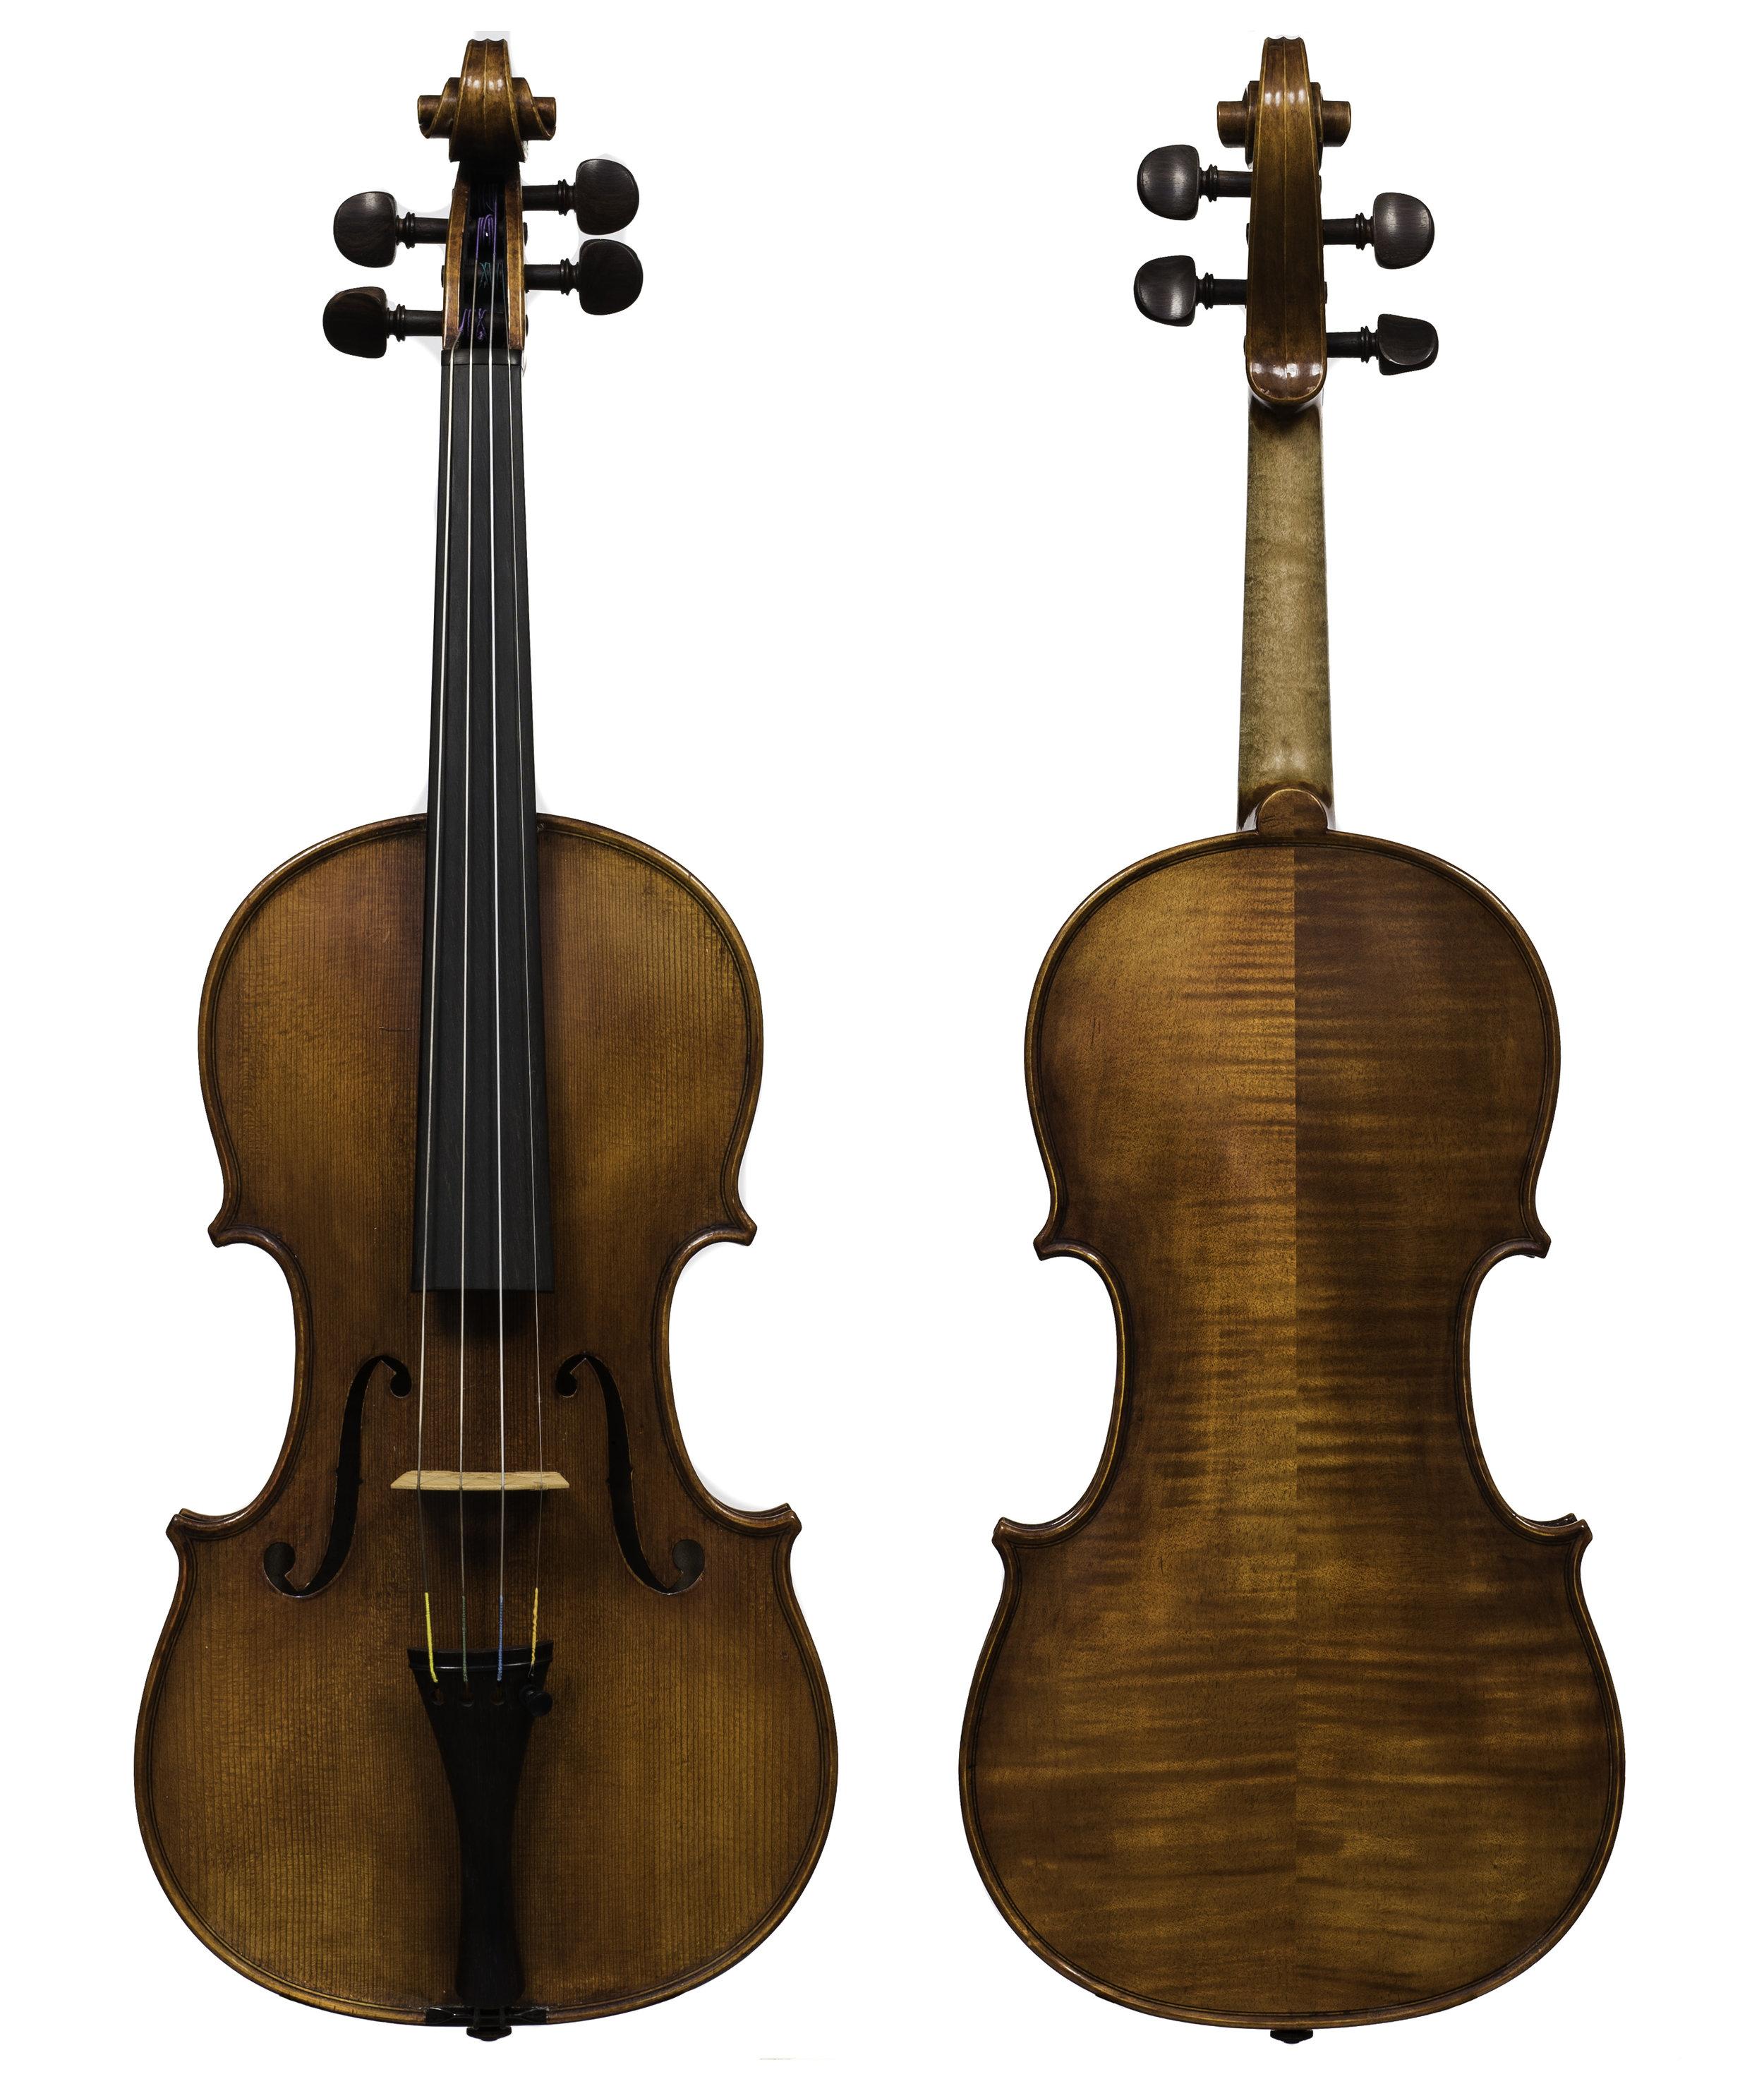 Unlabeled Violin